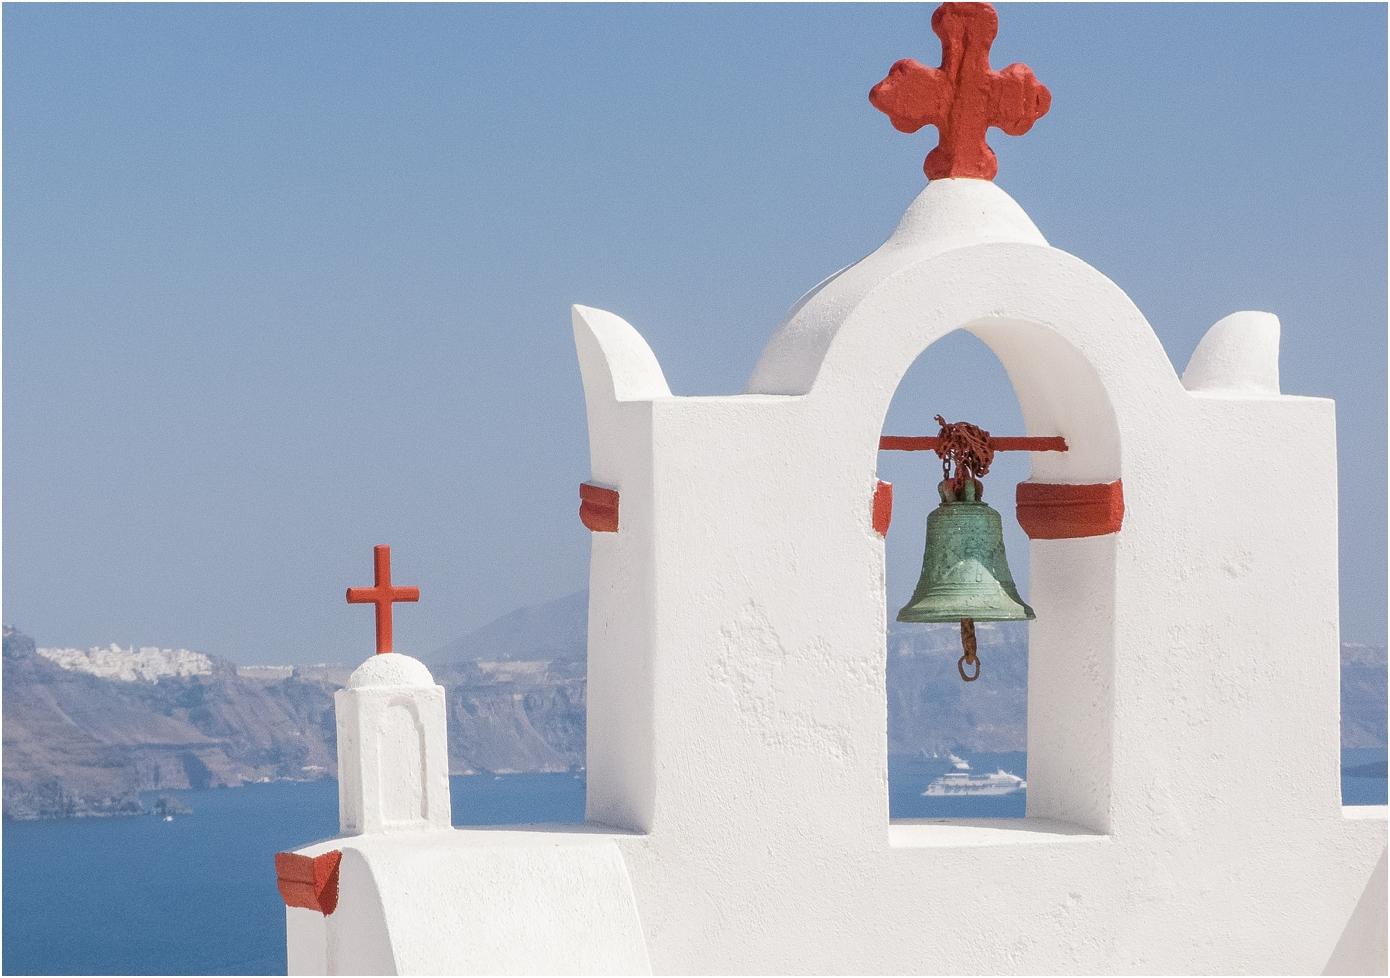 santorini-greece-wedding-photos-in-oia-destination-wedding-photographer-by-courtney-carolyn-photography_0006.jpg